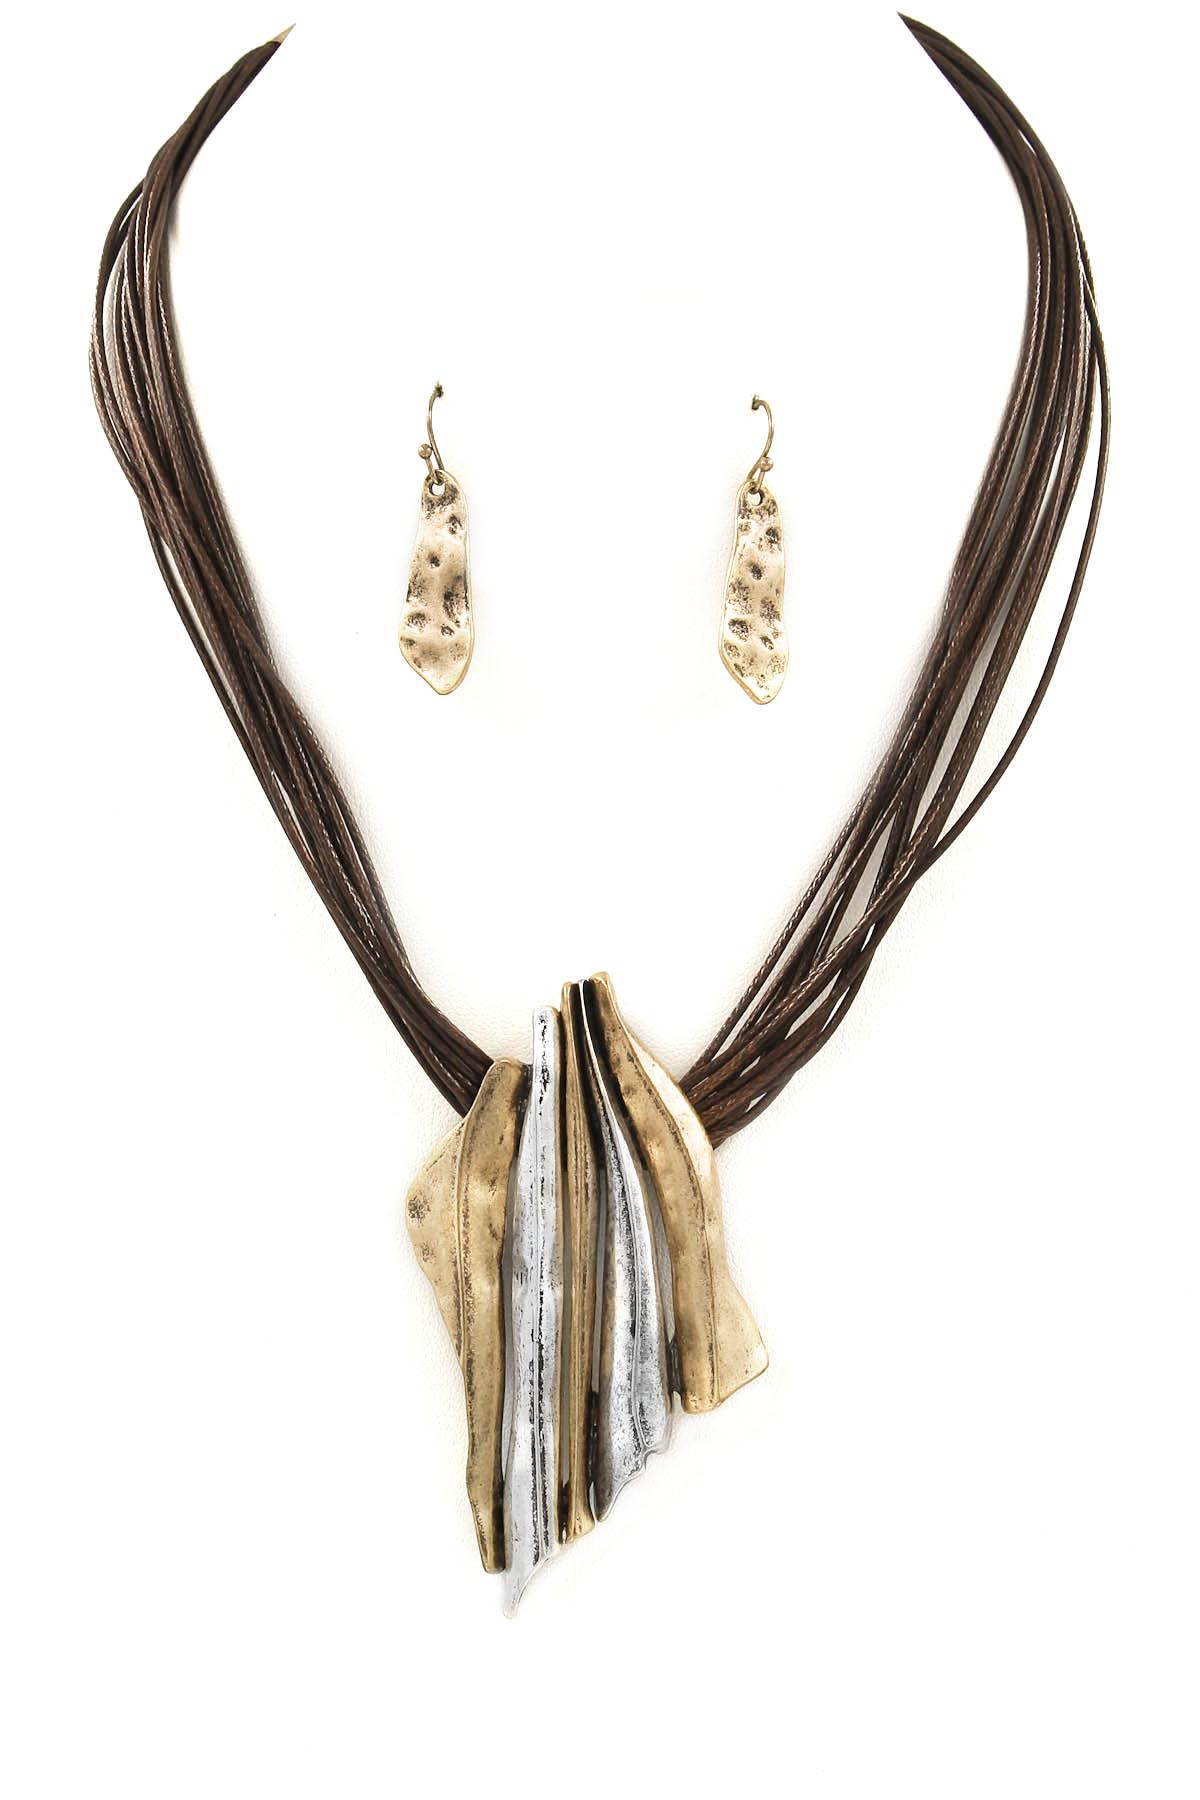 Metal Bar Pendant Wax Cord Necklace Set